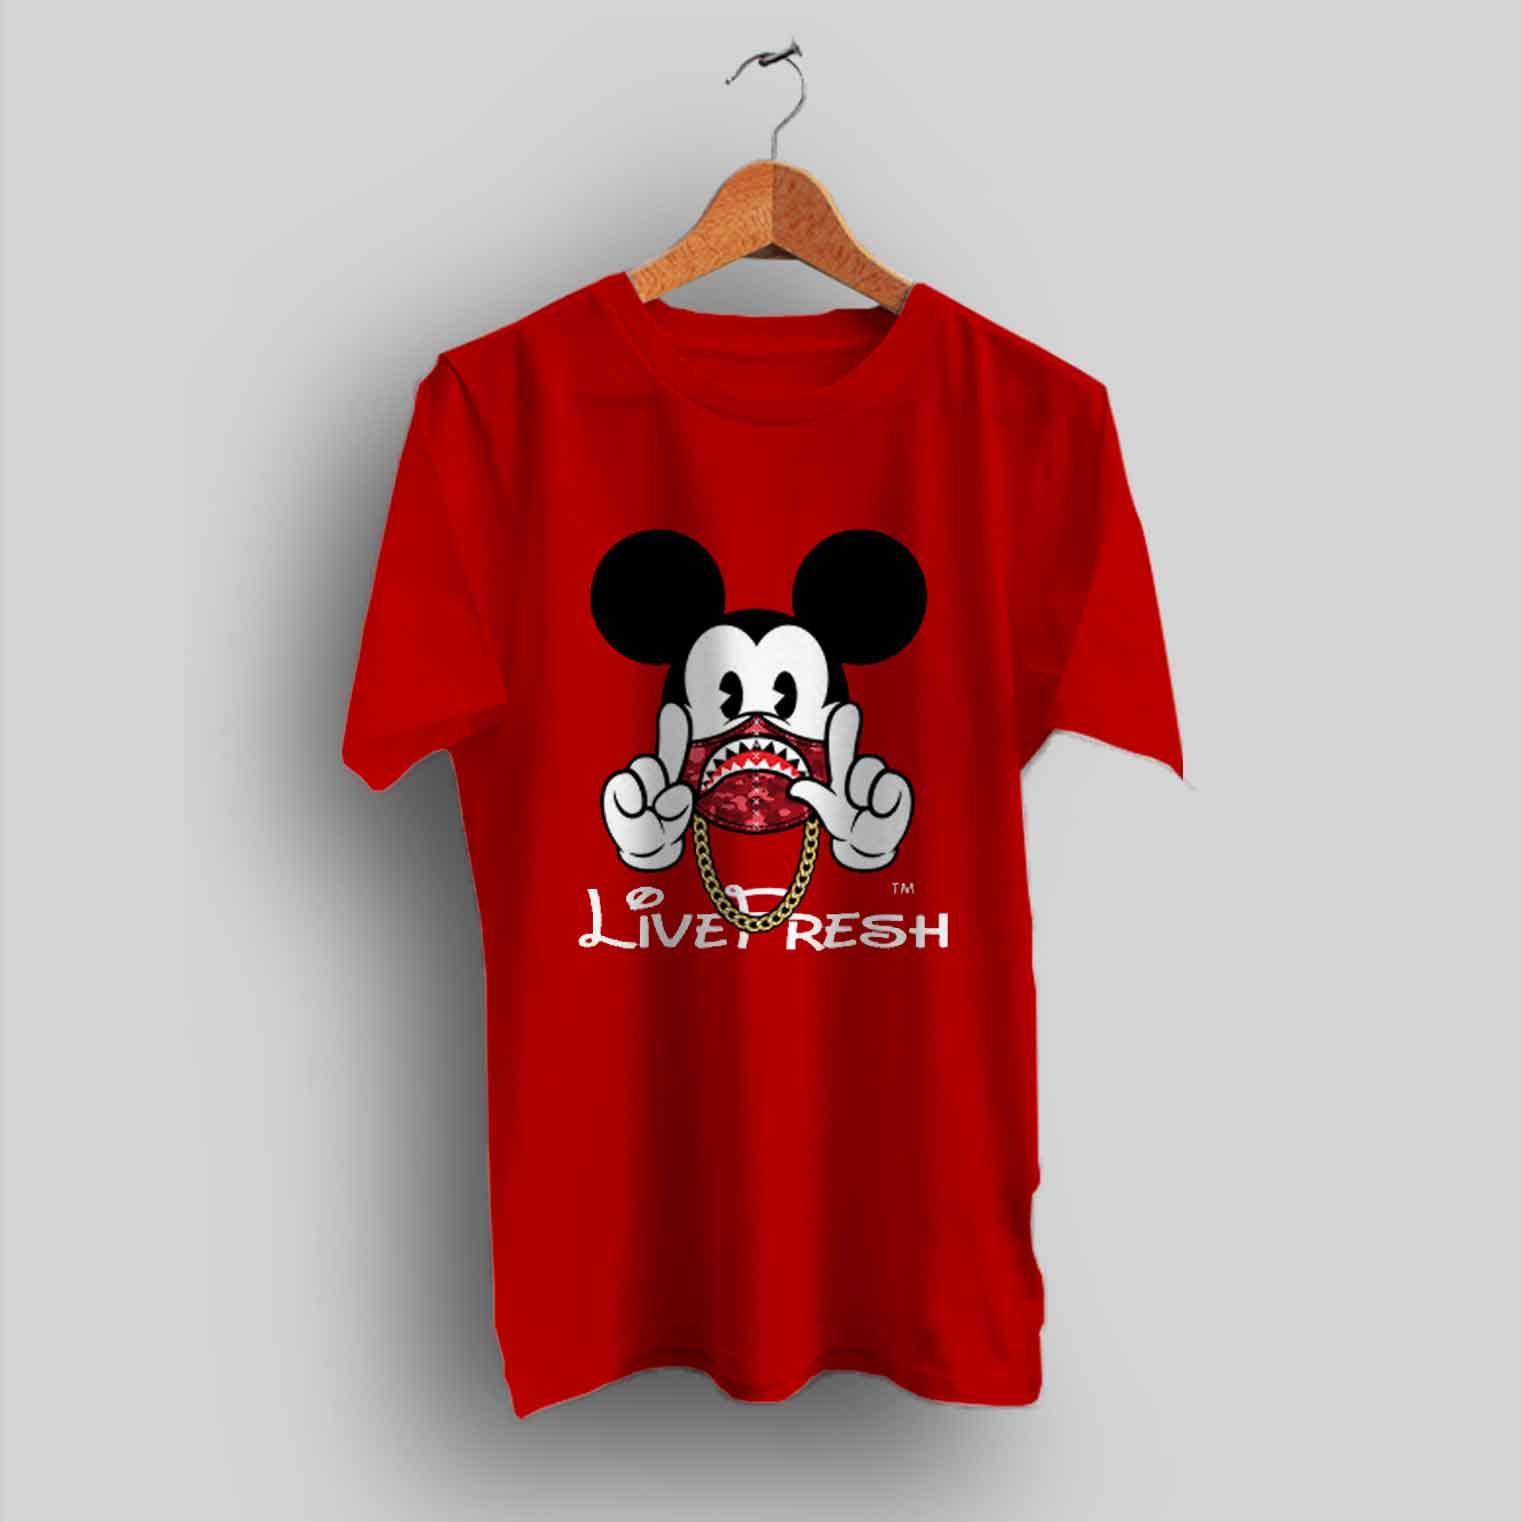 4430aa26 Mickey Mouse X Bape Live Fresh Urban T Shirt - HotVero.com